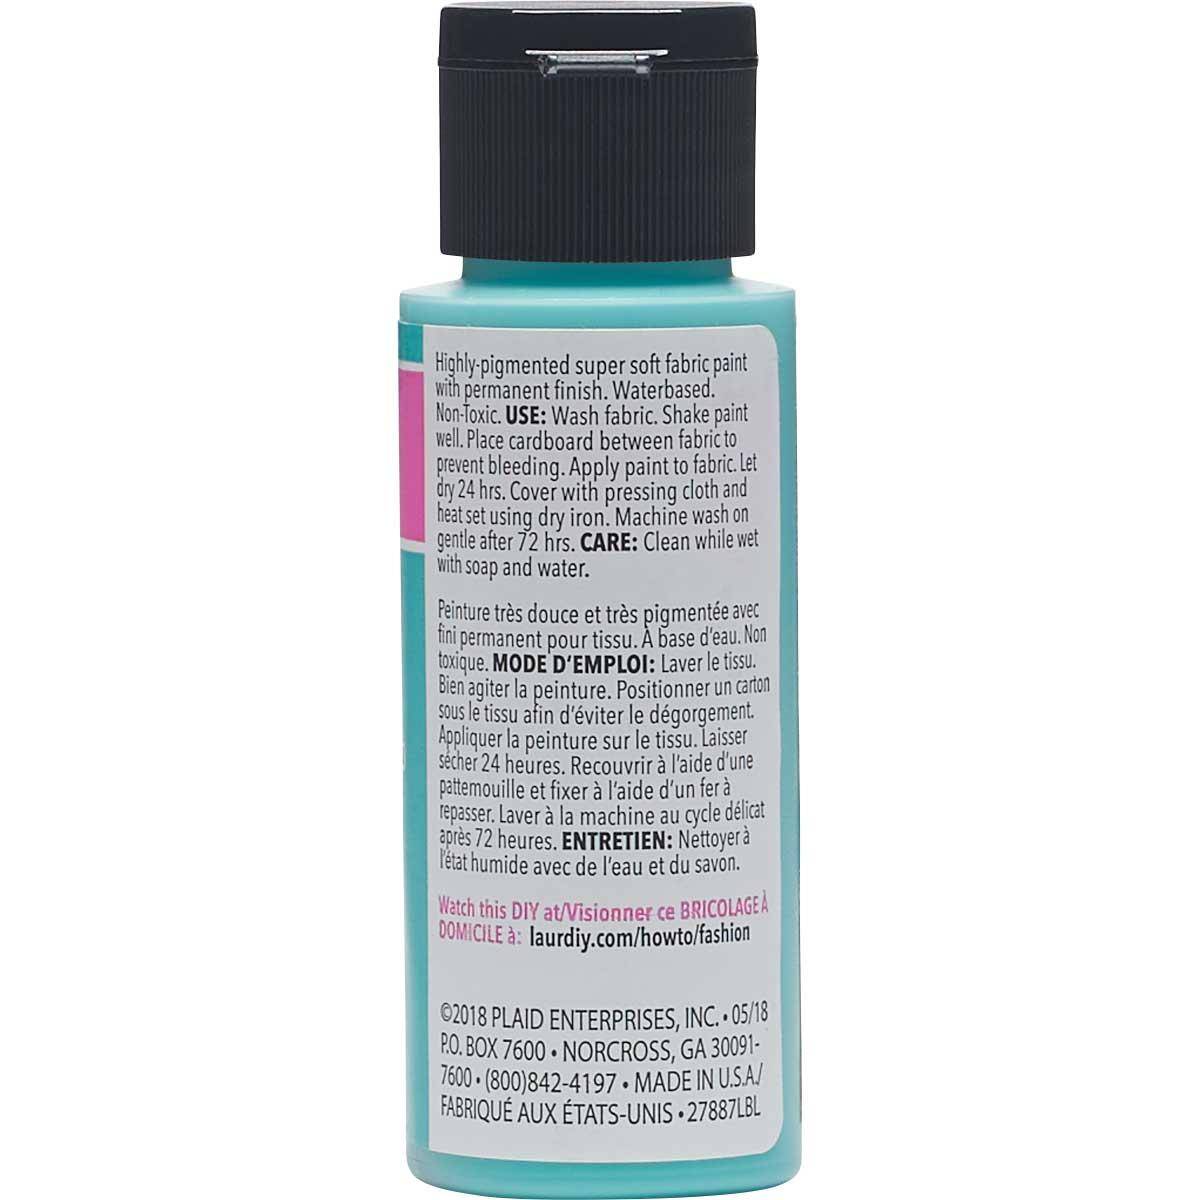 LaurDIY ® Perfect Fabric Paint - Aquamarine, 2 oz.